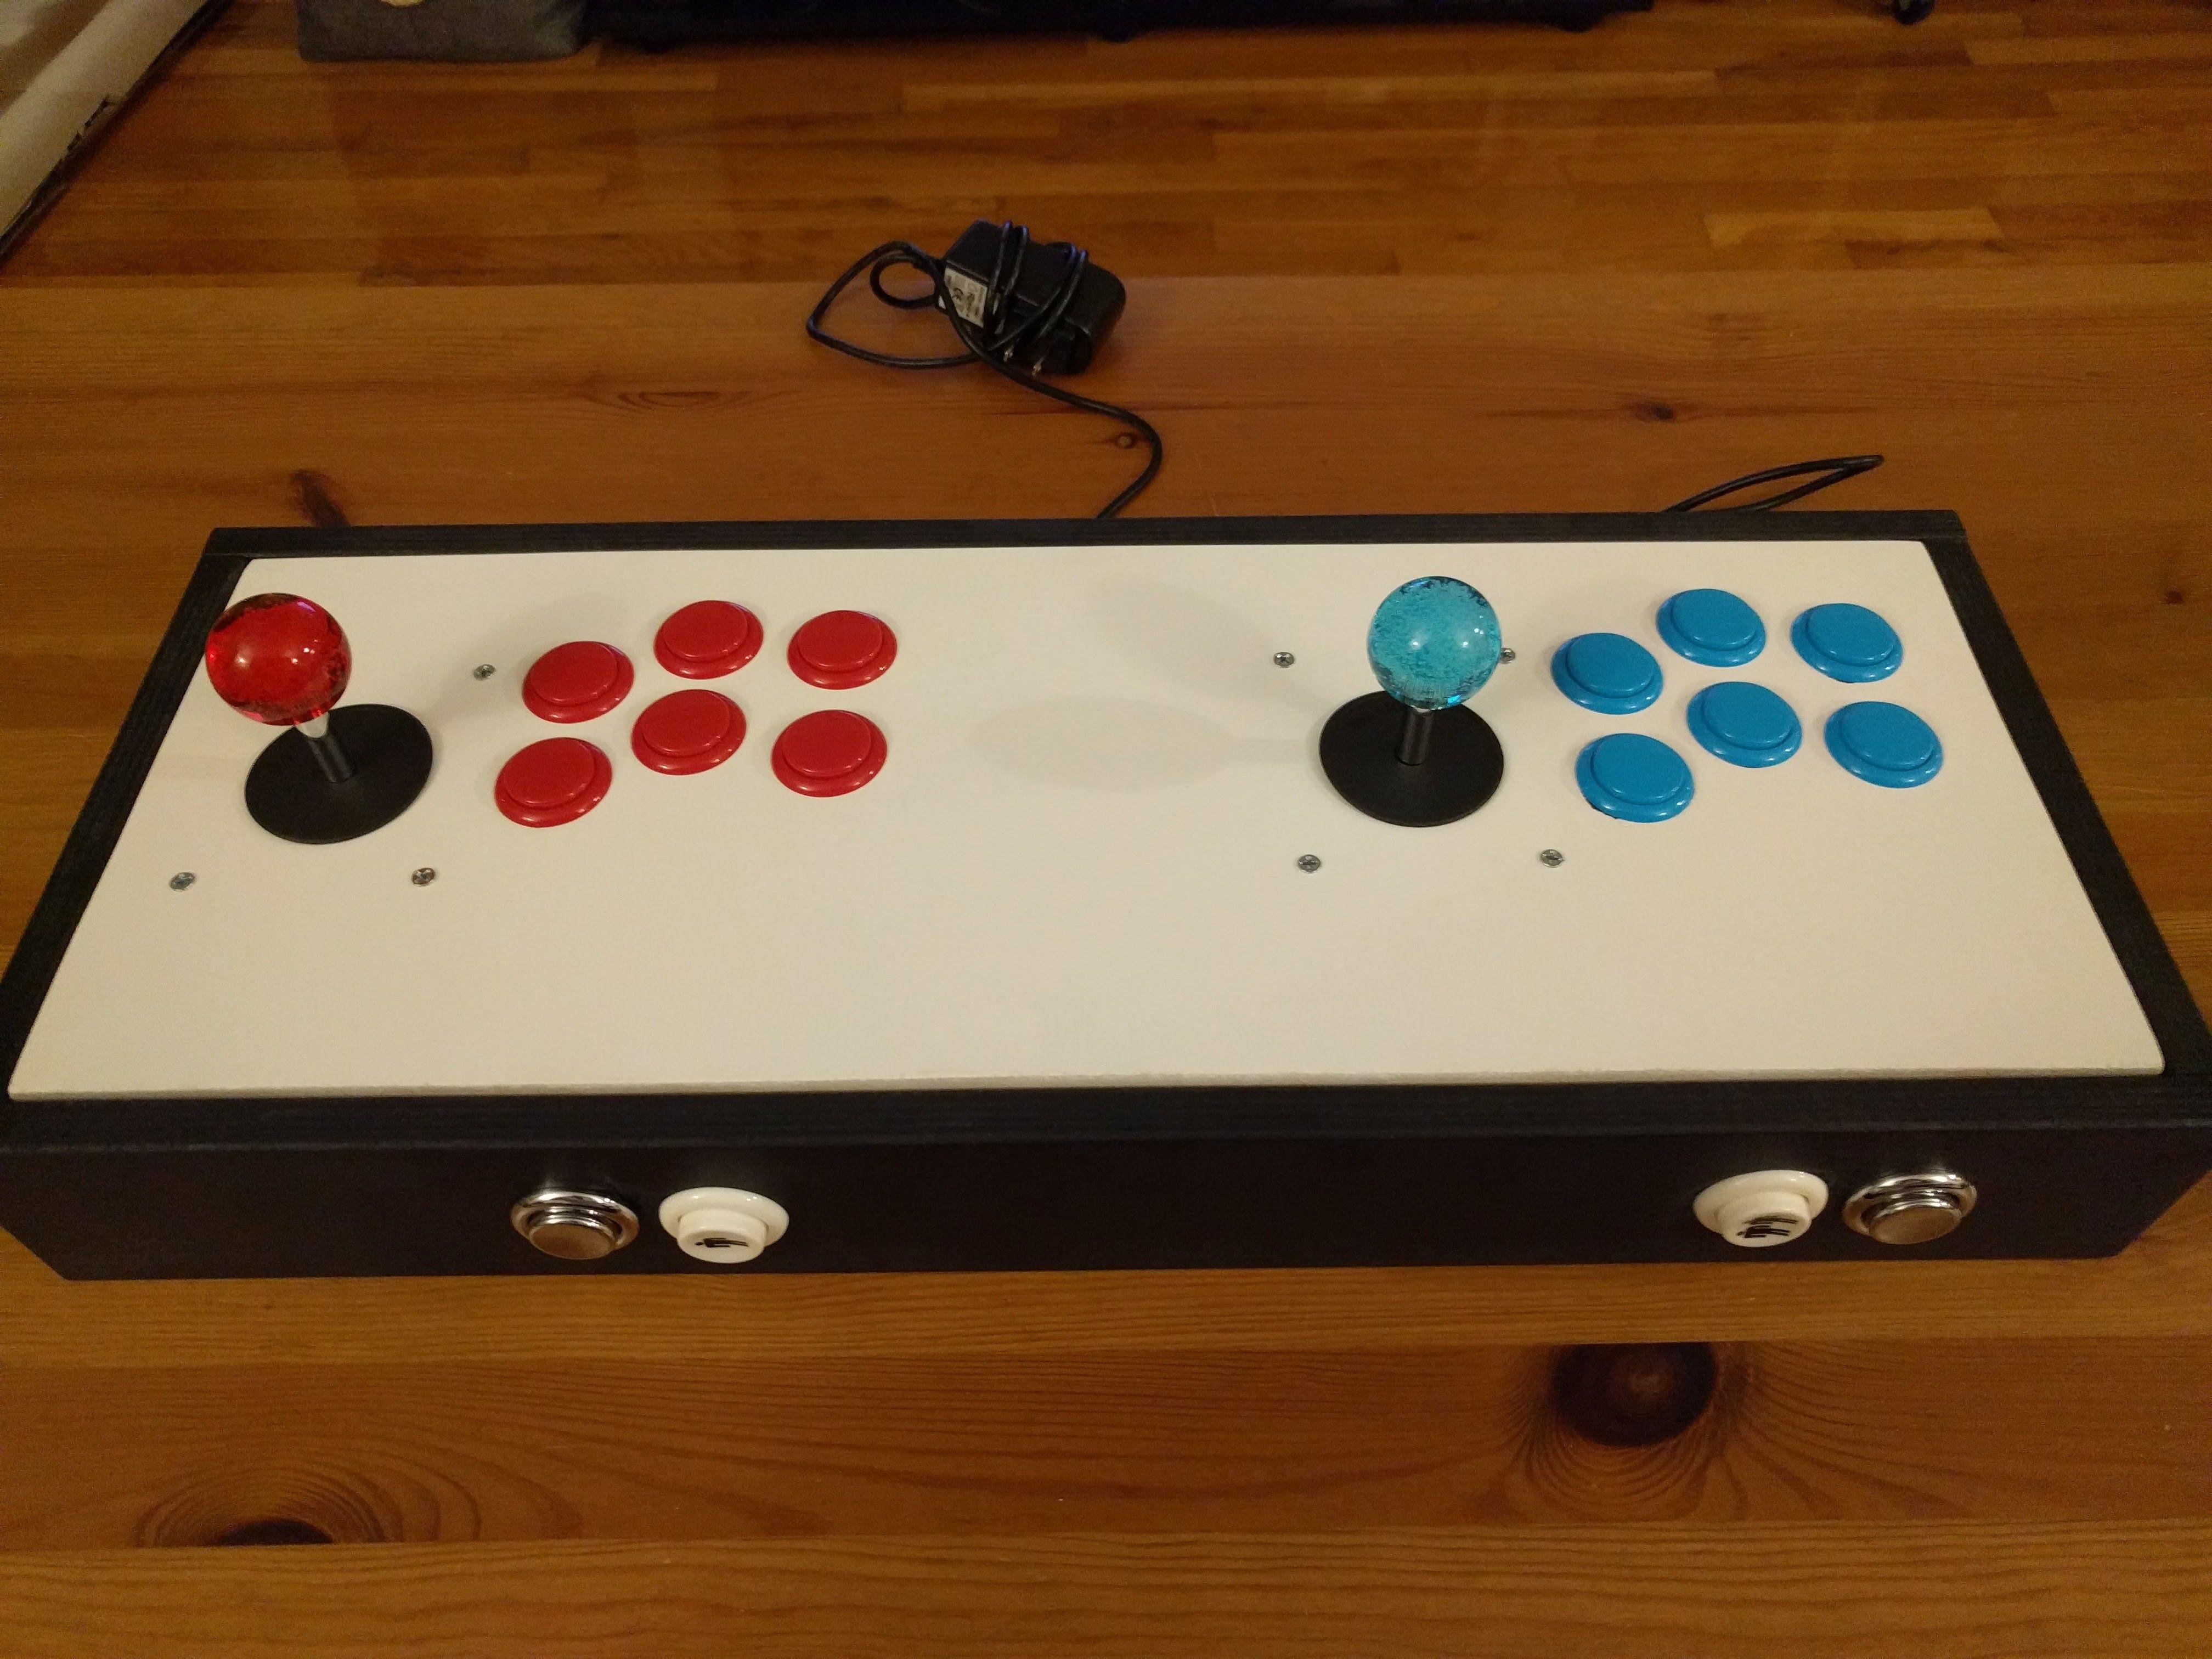 2 Player Arcade Stick Powered By Rpi Handmade Crafts Howto Diy Arcade Stick Arcade Stick